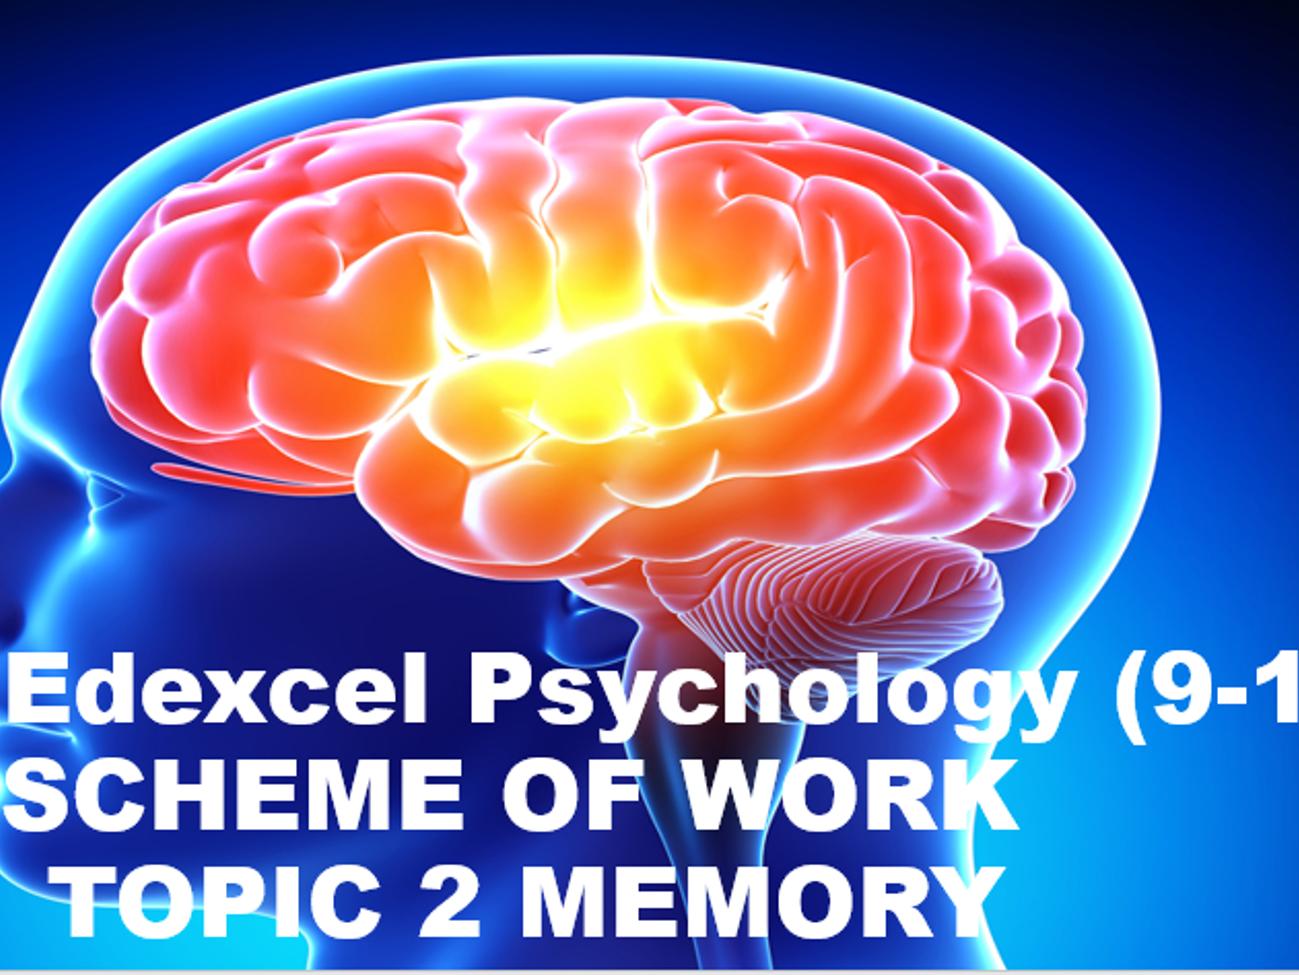 GCSE Edexcel Psychology (9-1) SCHEME OF WORK FOR  TOPIC 2 MEMORY